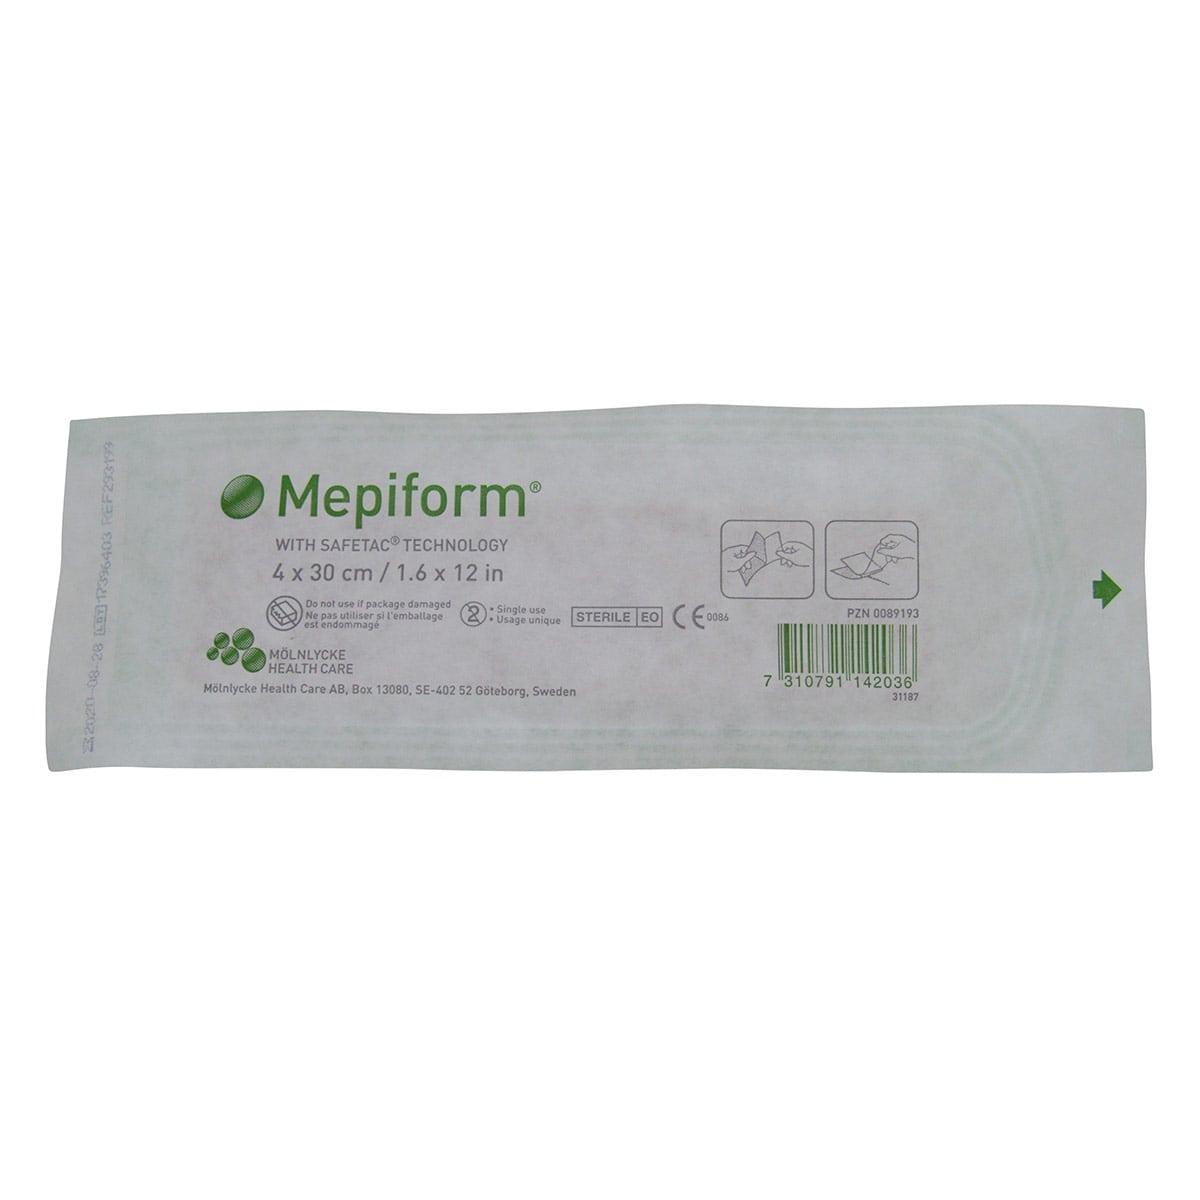 Curativo Mepiform 4x30cm Silicone Molnlycke